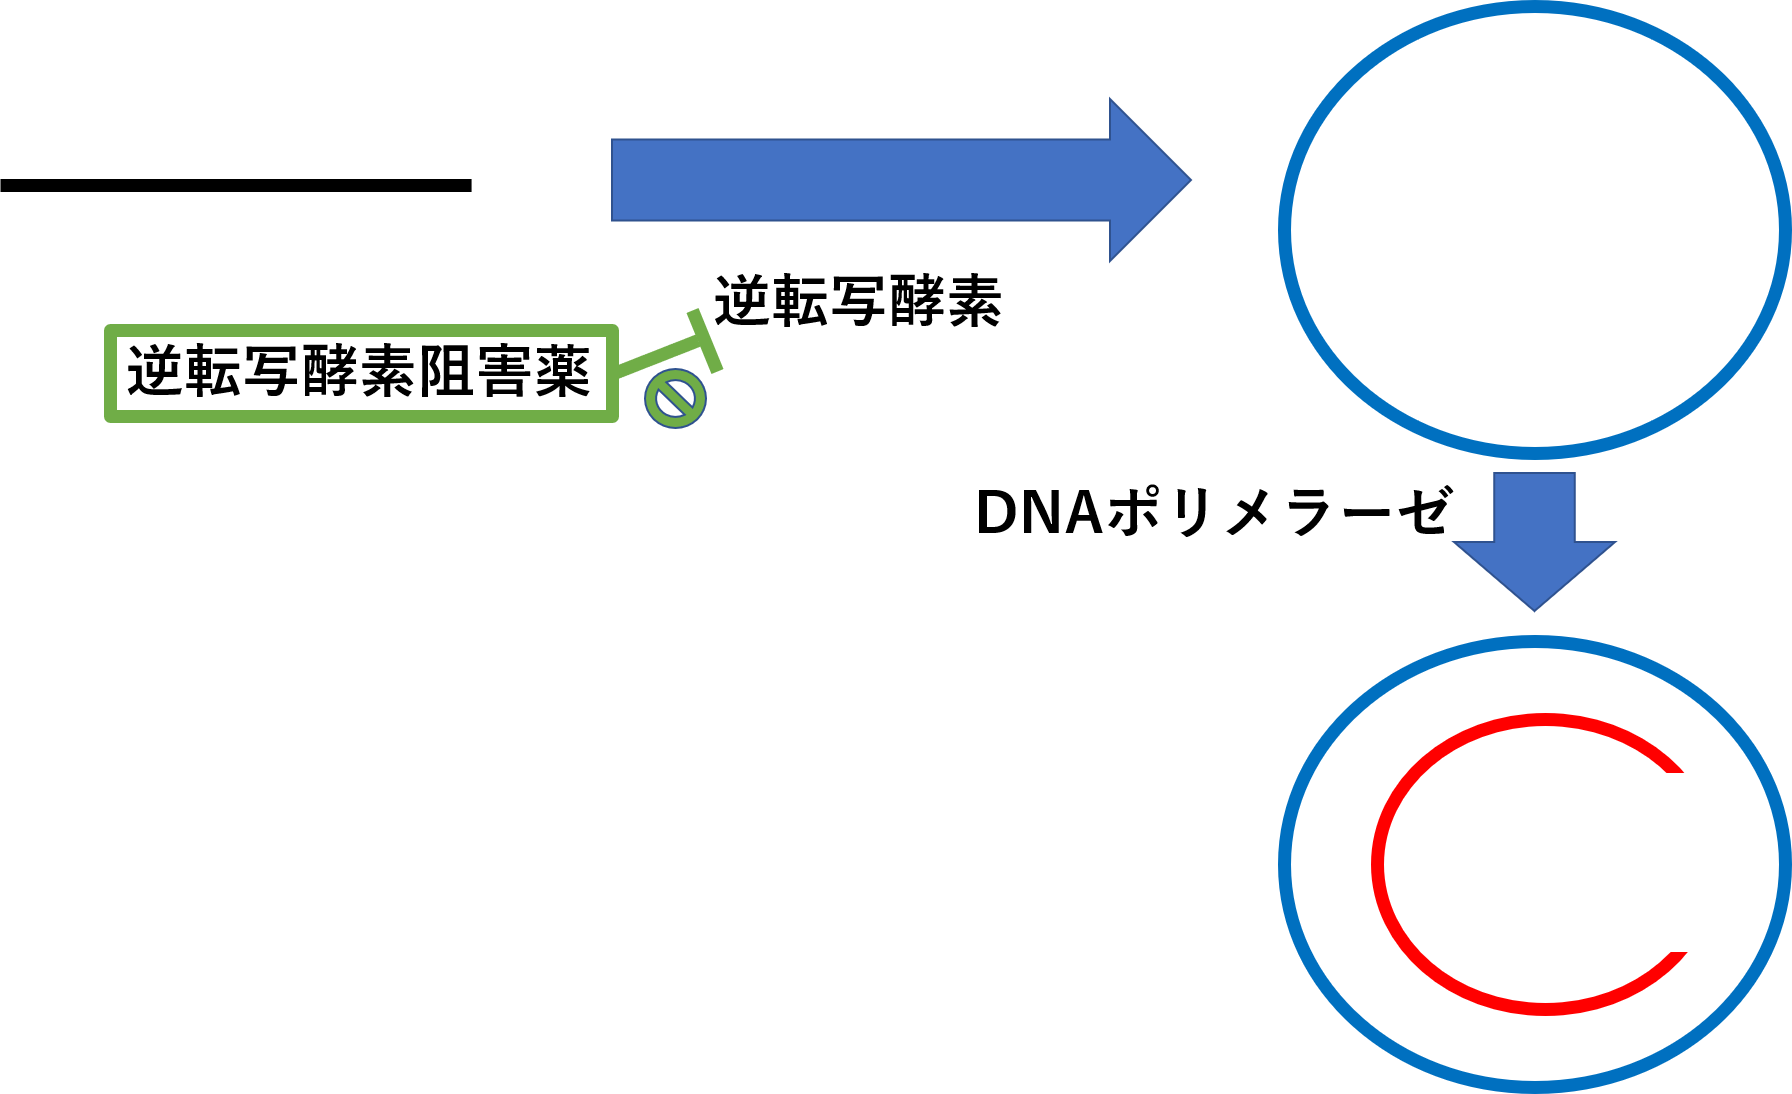 B型肝炎治療薬の逆転写酵素阻害薬は逆転写を阻害する